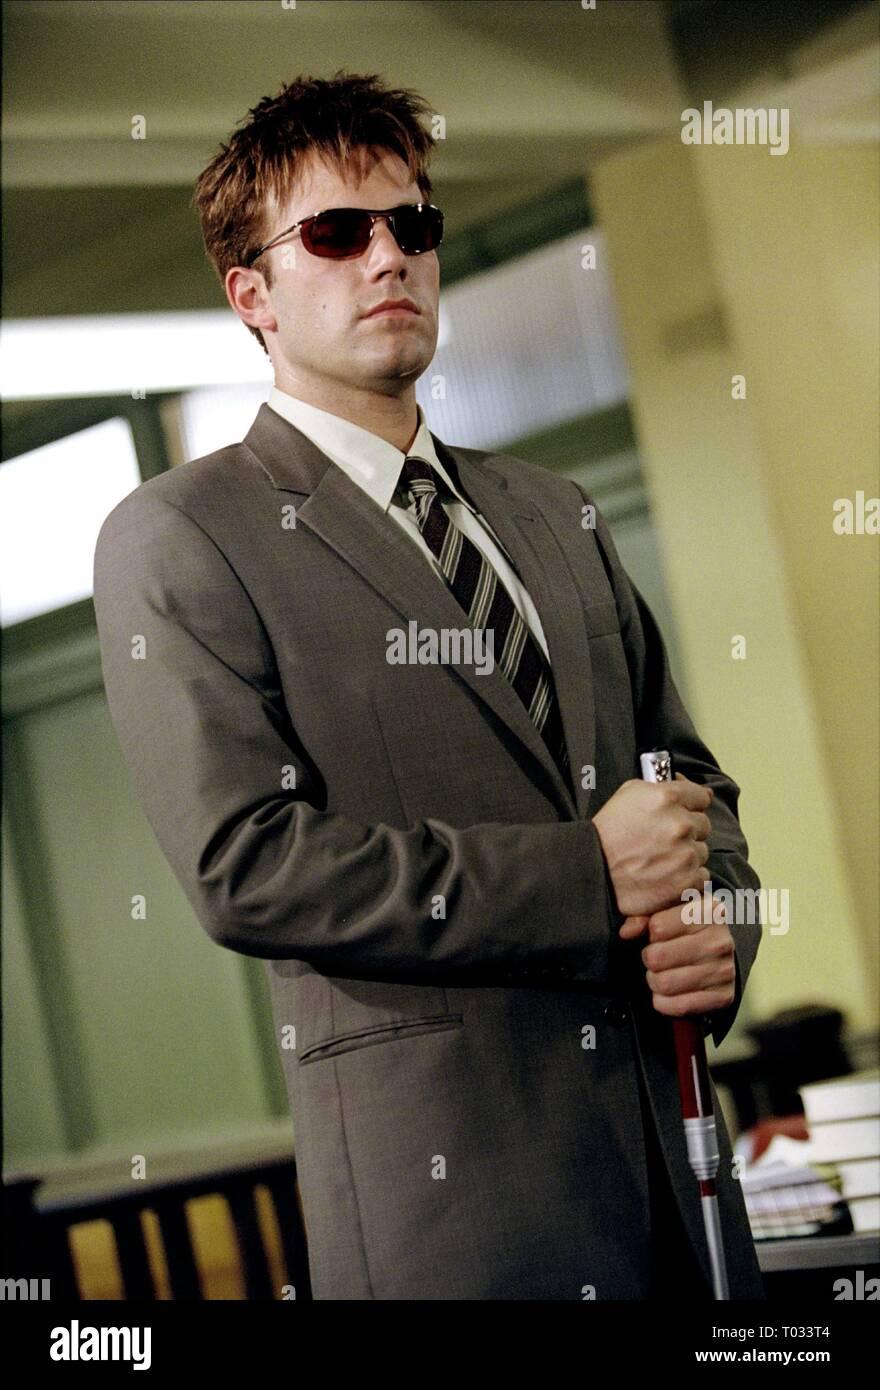 BEN AFFLECK, DAREDEVIL, 2003 - Stock Image